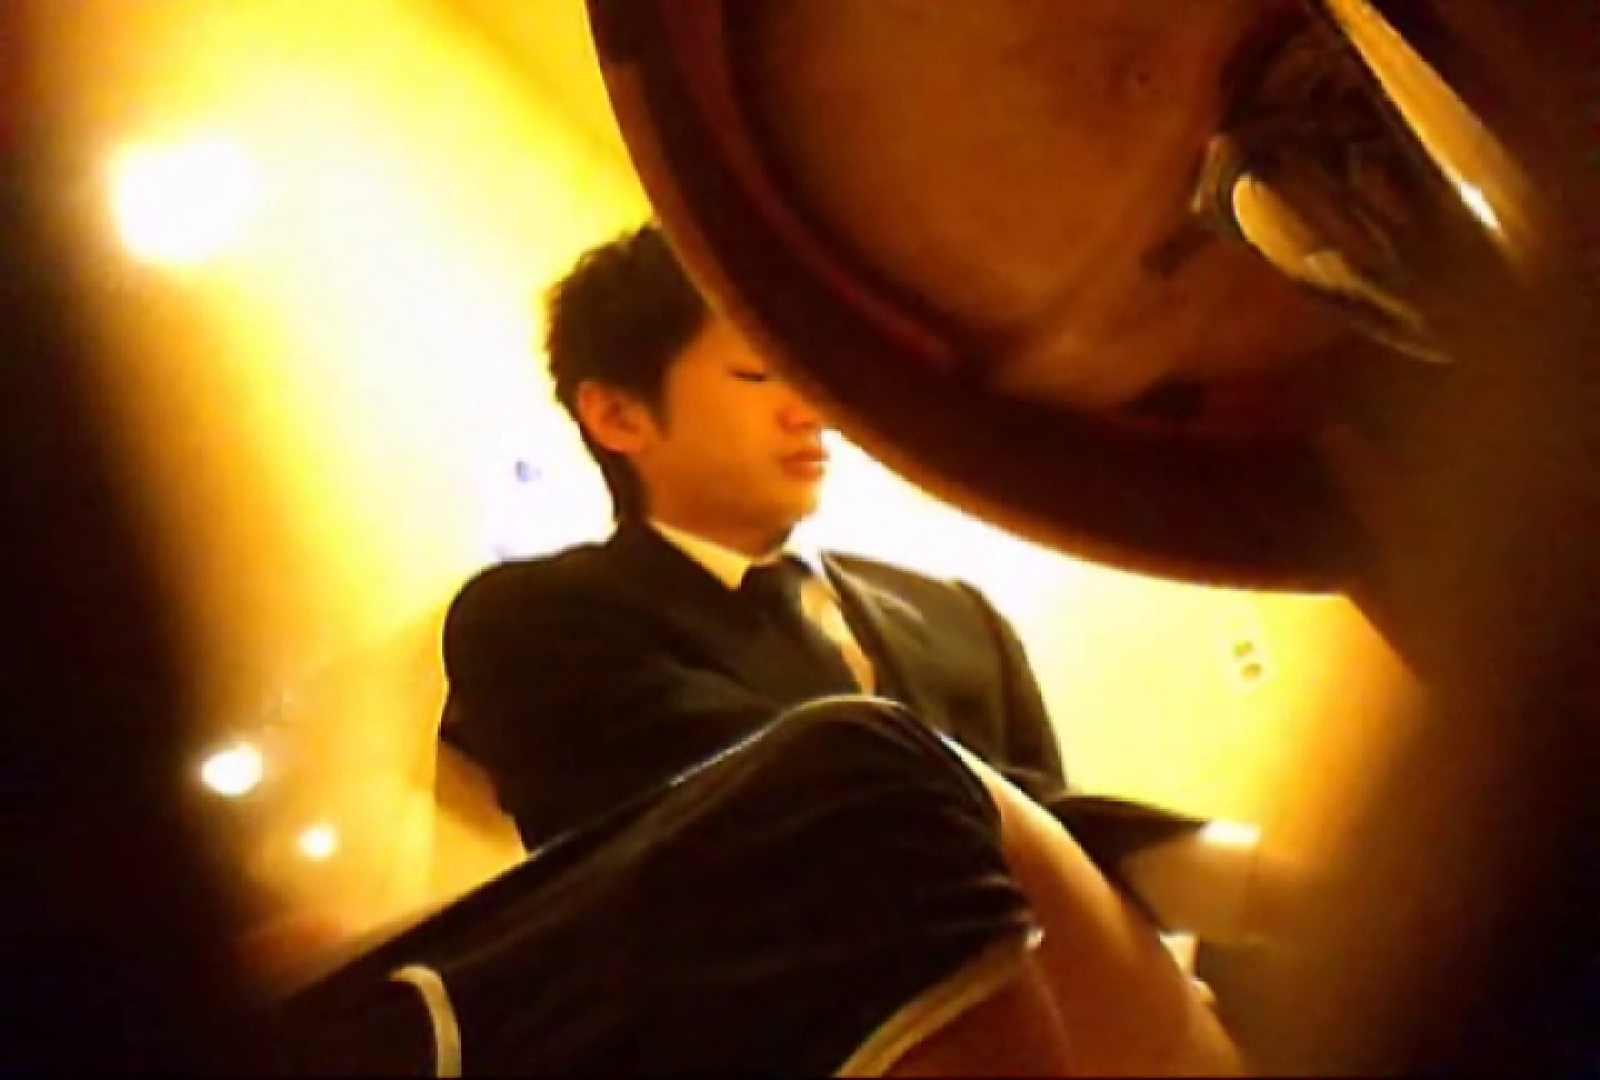 SEASON 3rd!掴み取りさんの洗面所覗き!in新幹線!VOL.23 完全無修正  81pic 13